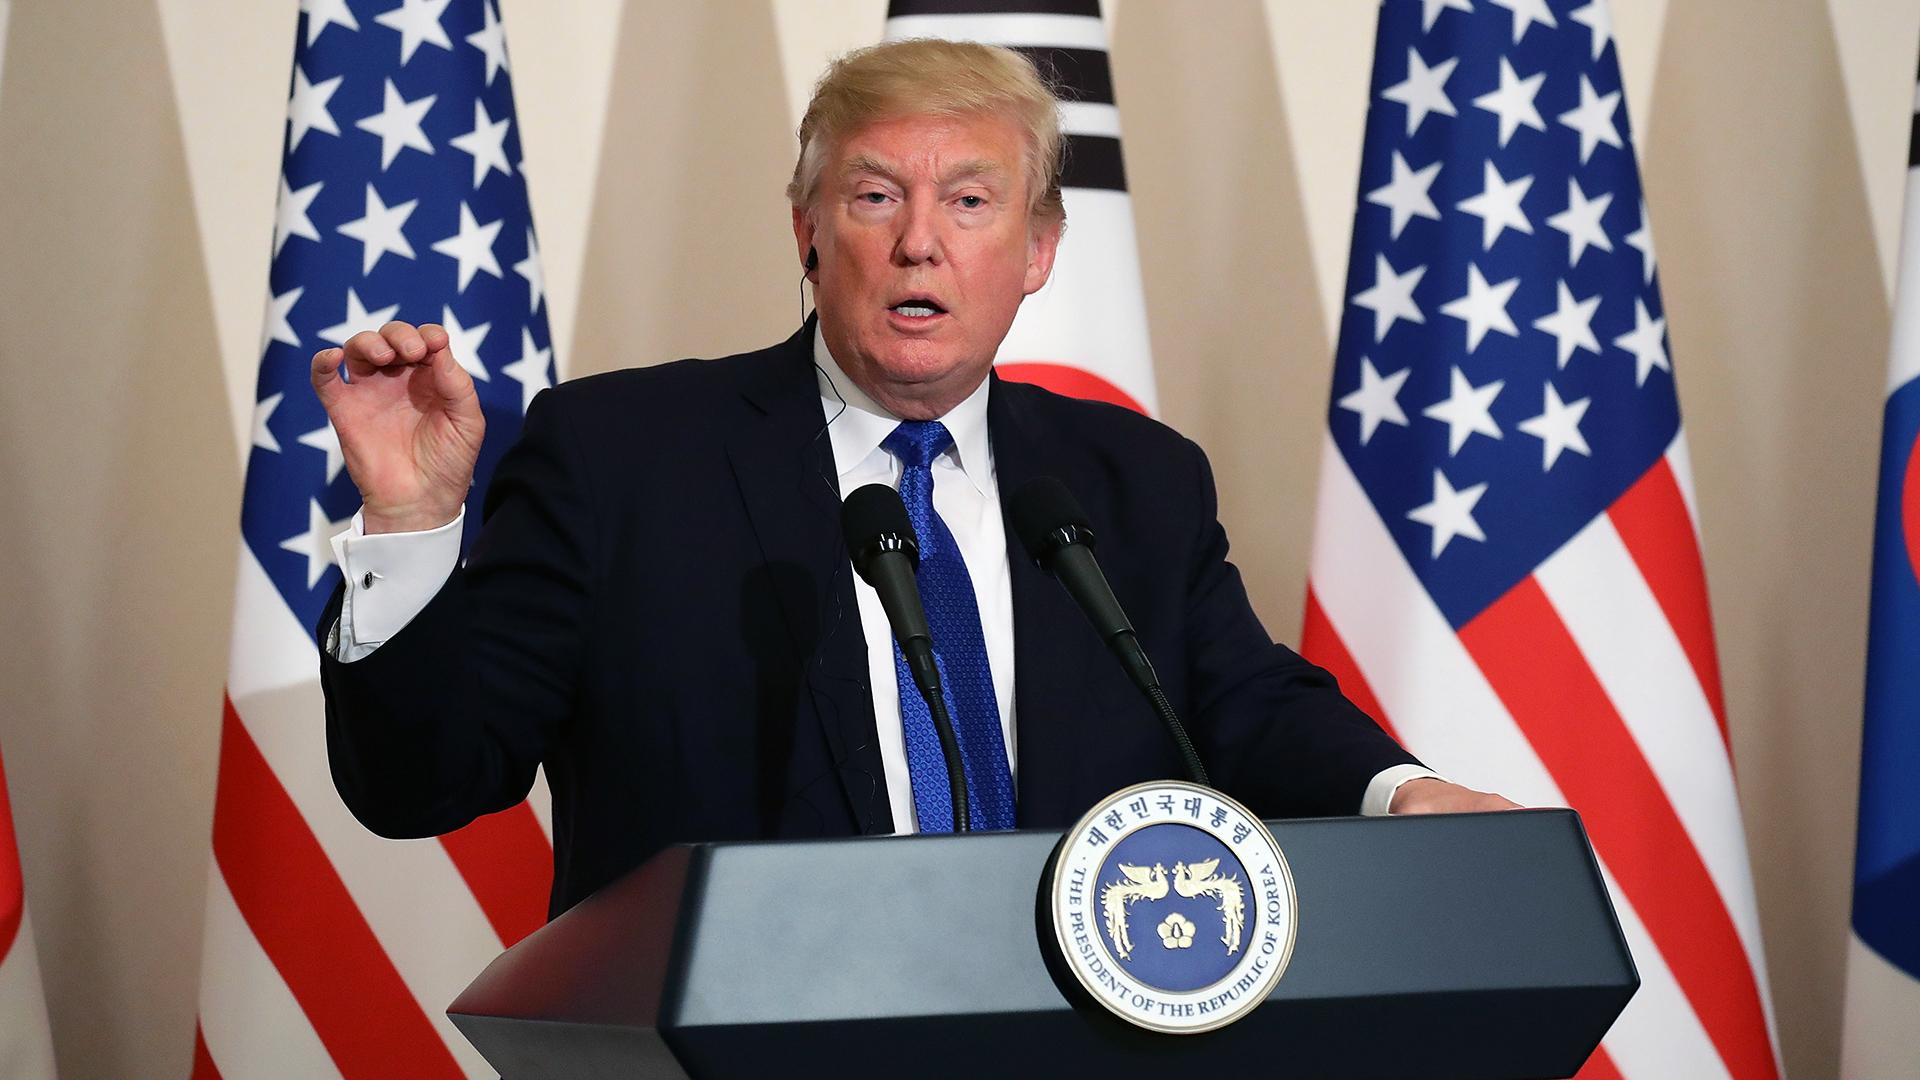 President Trump at South Korea news conference-159532.jpg66658185